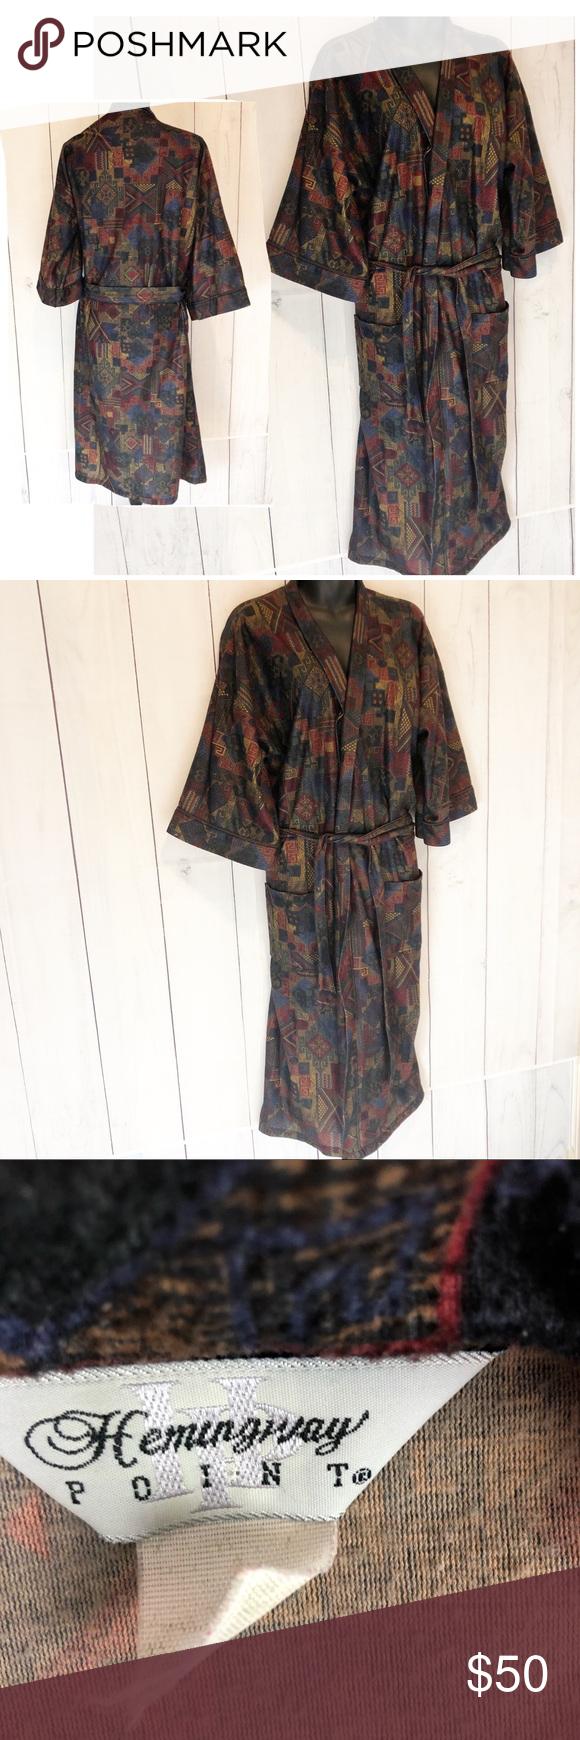 a40e5c282f Vintage 70s Hemingway Point Men s Robe Medium Vintage 70s SO SOFT Hemingway  Point Men s robe Size